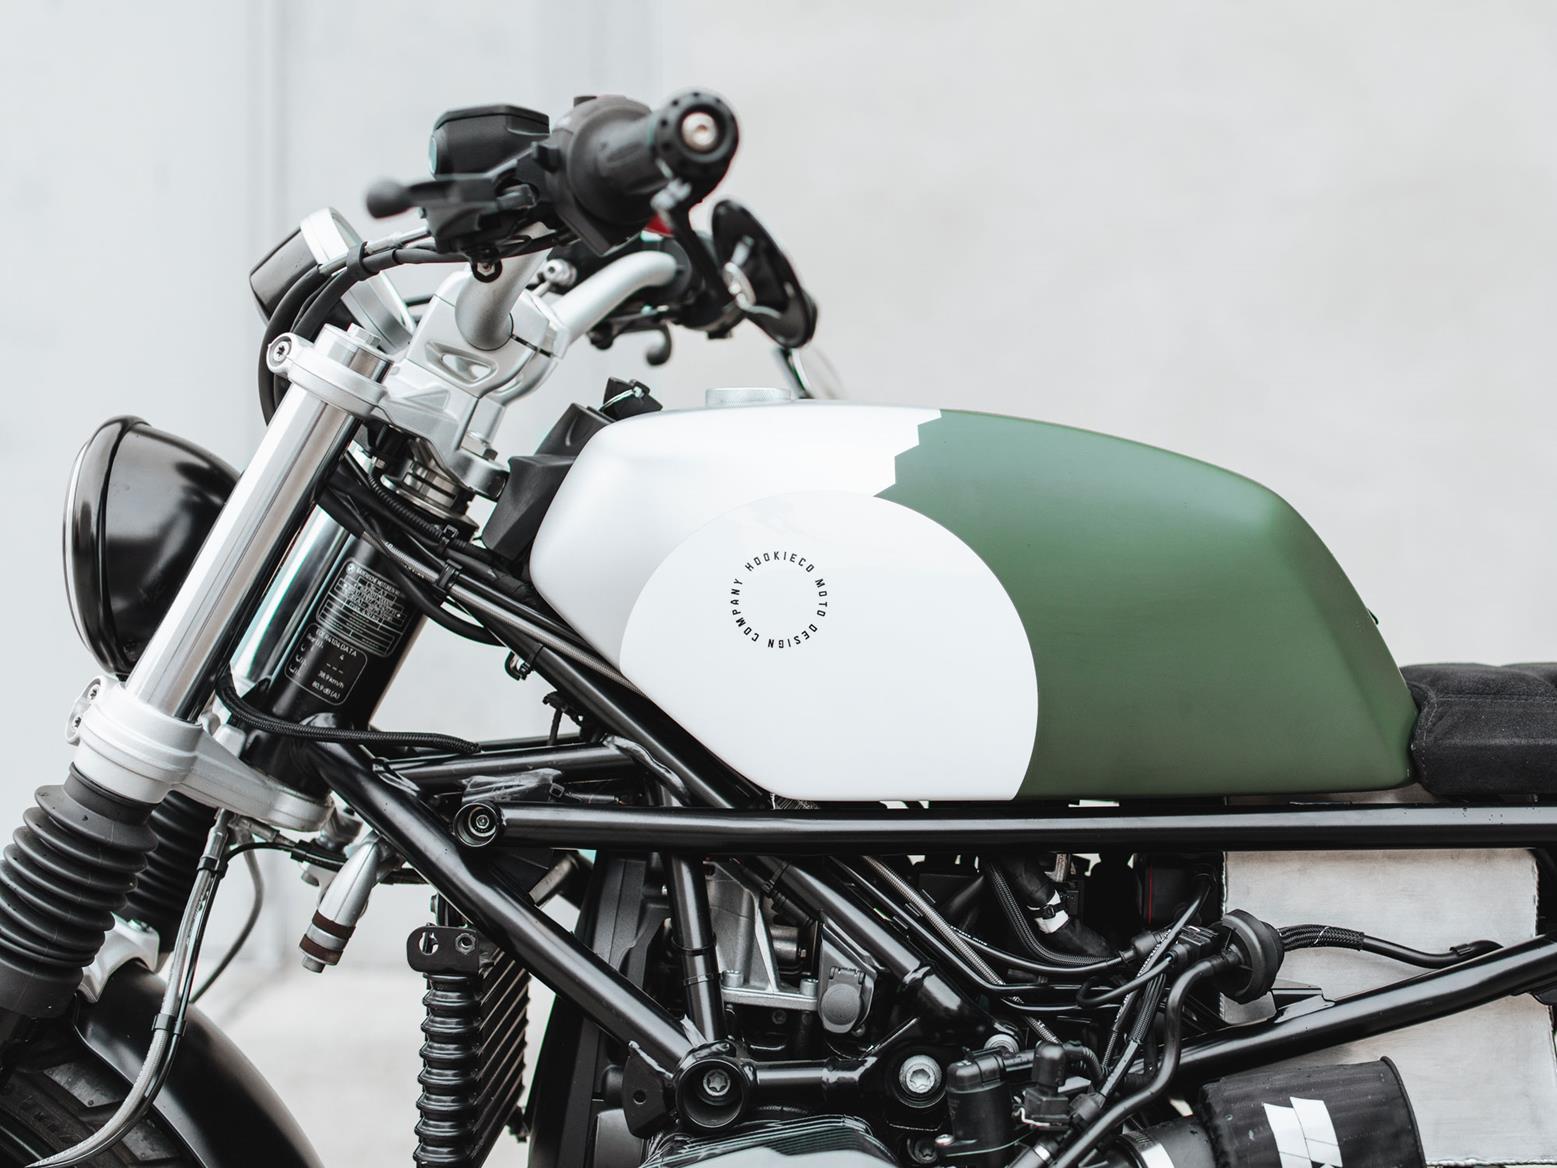 Custom fuel tank on the BMW RNineT Moto-Kit